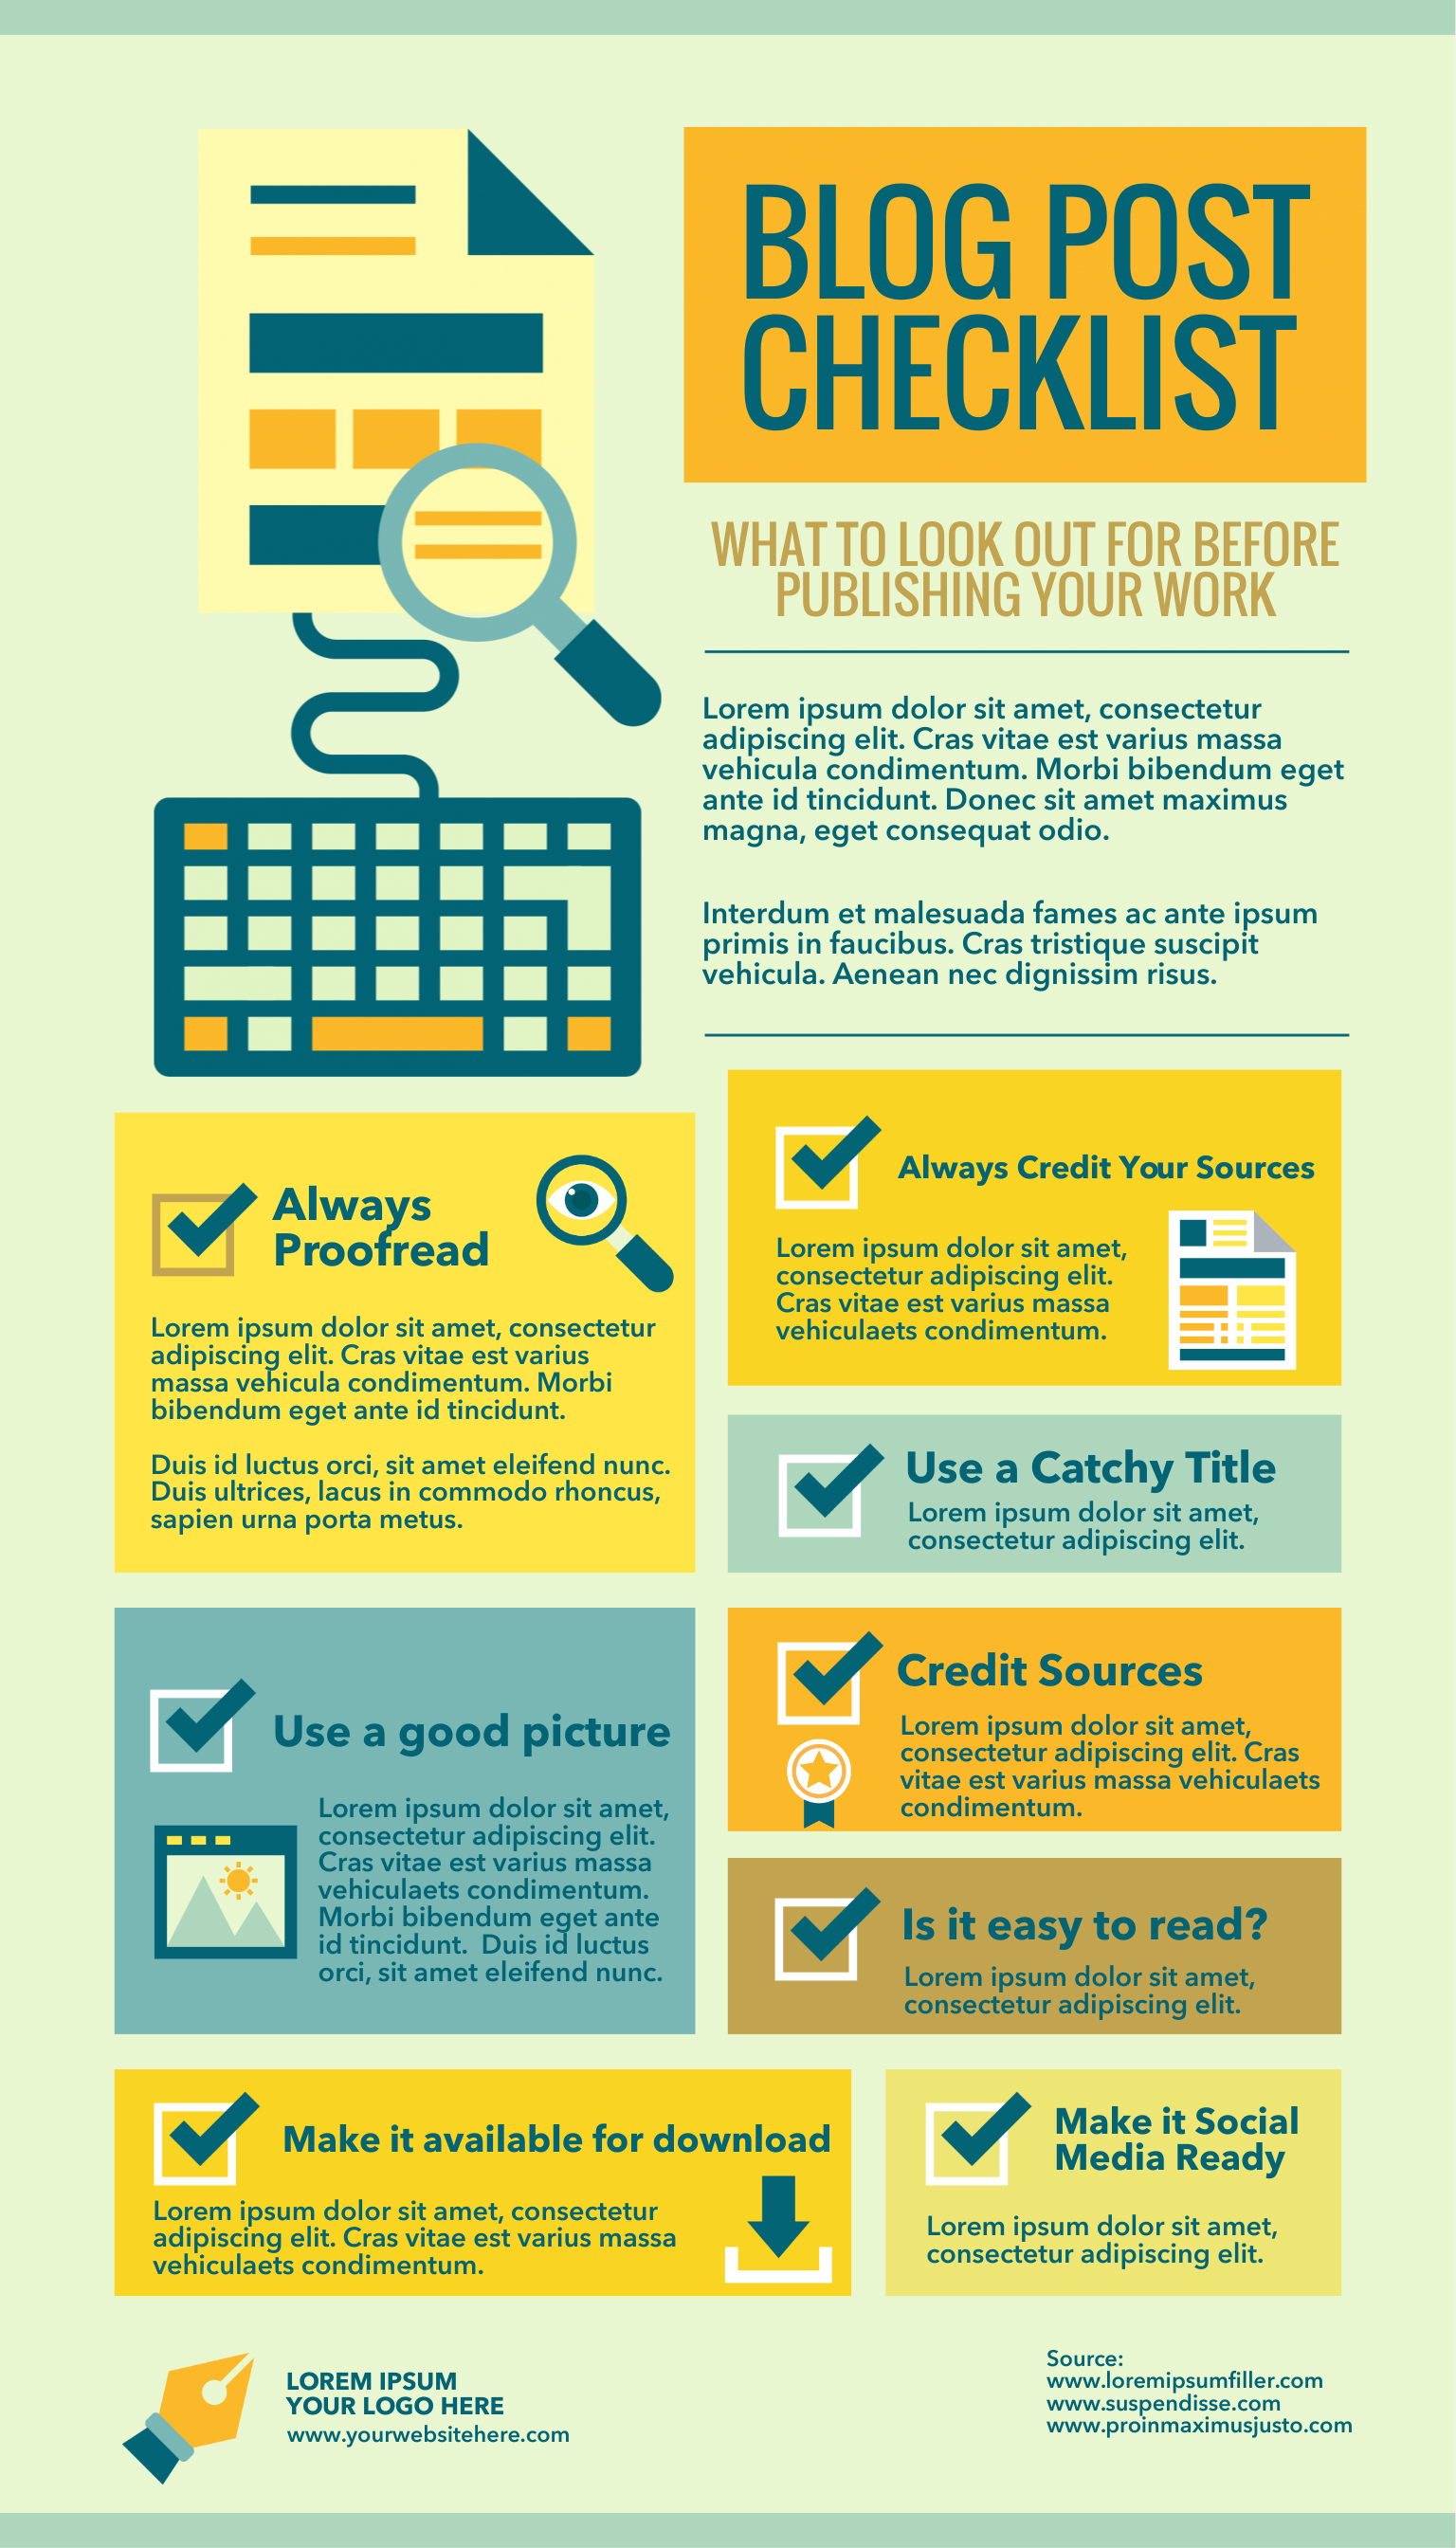 Blog checklist infographic template